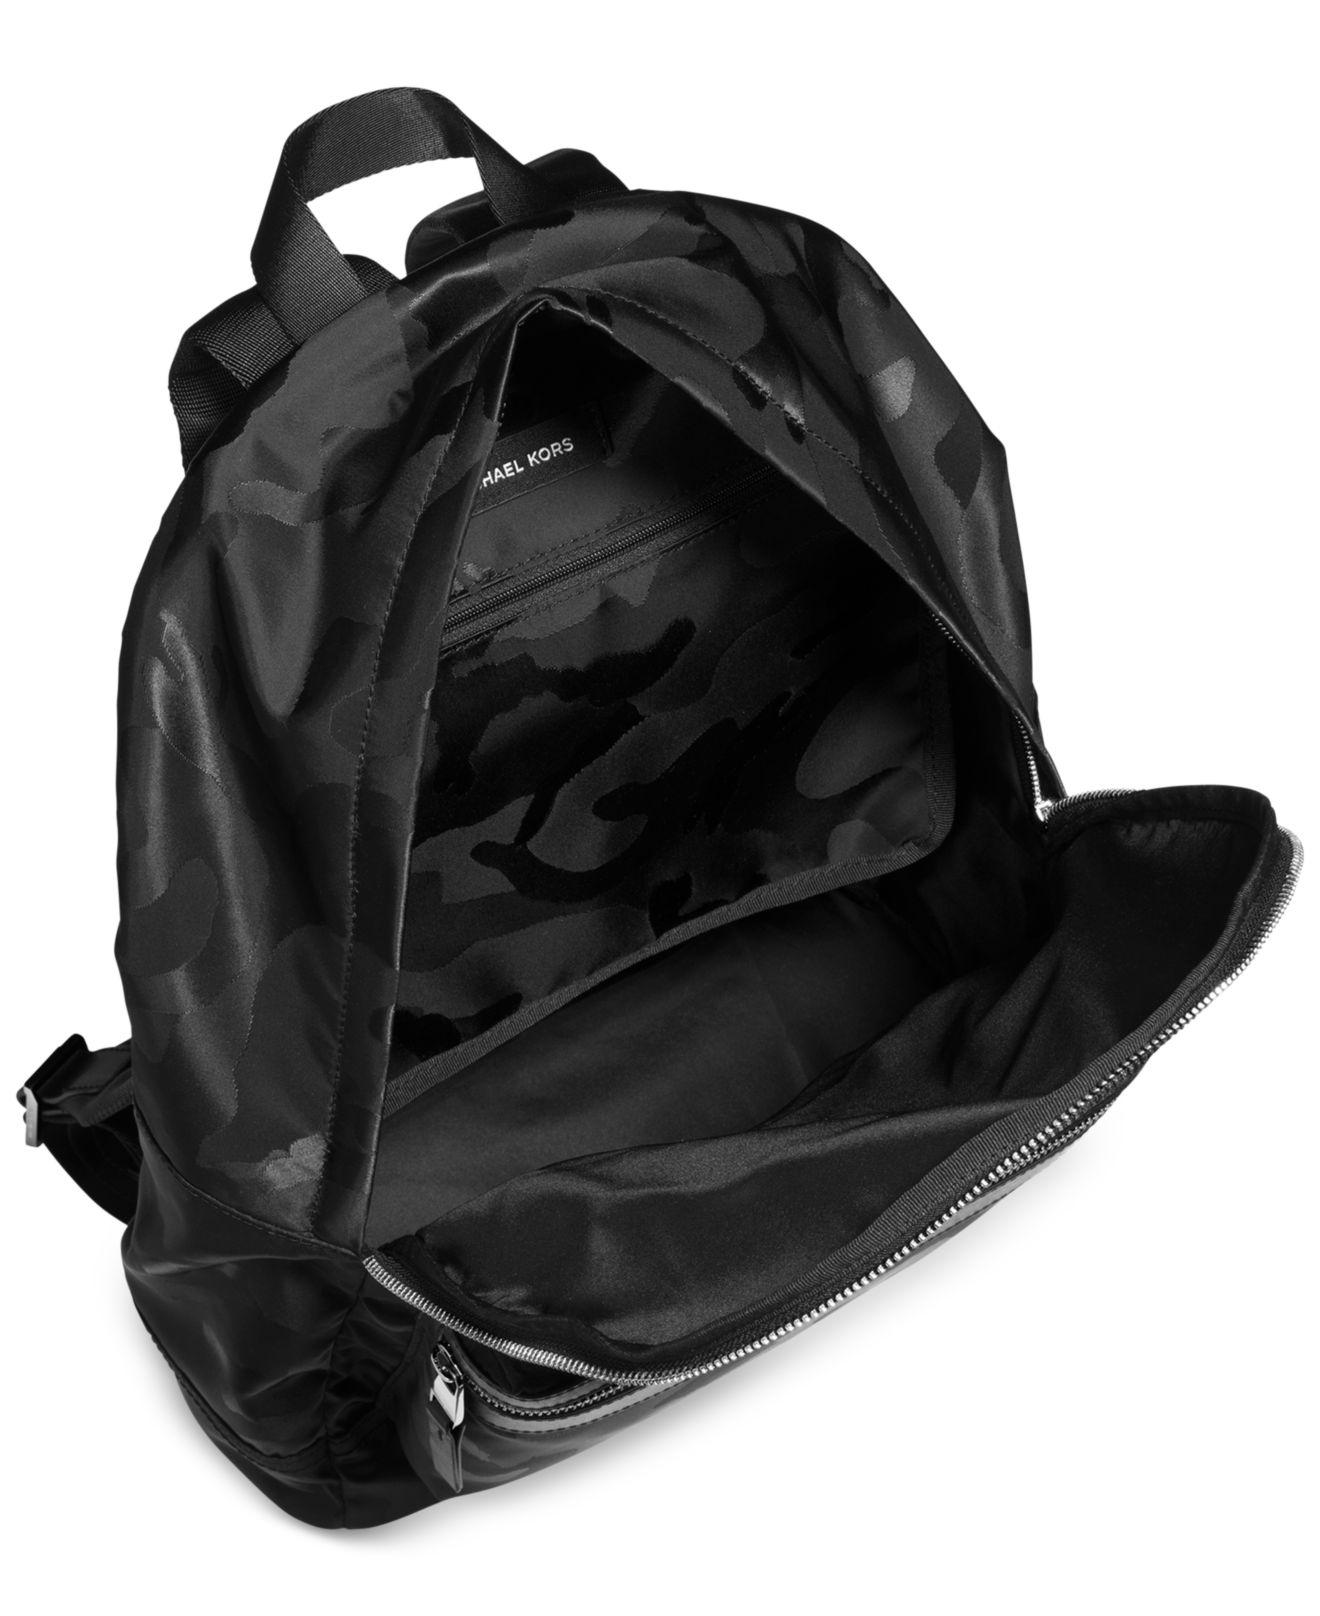 dae35c8b988833 Michael Kors Kent Camo Backpack in Black for Men - Lyst